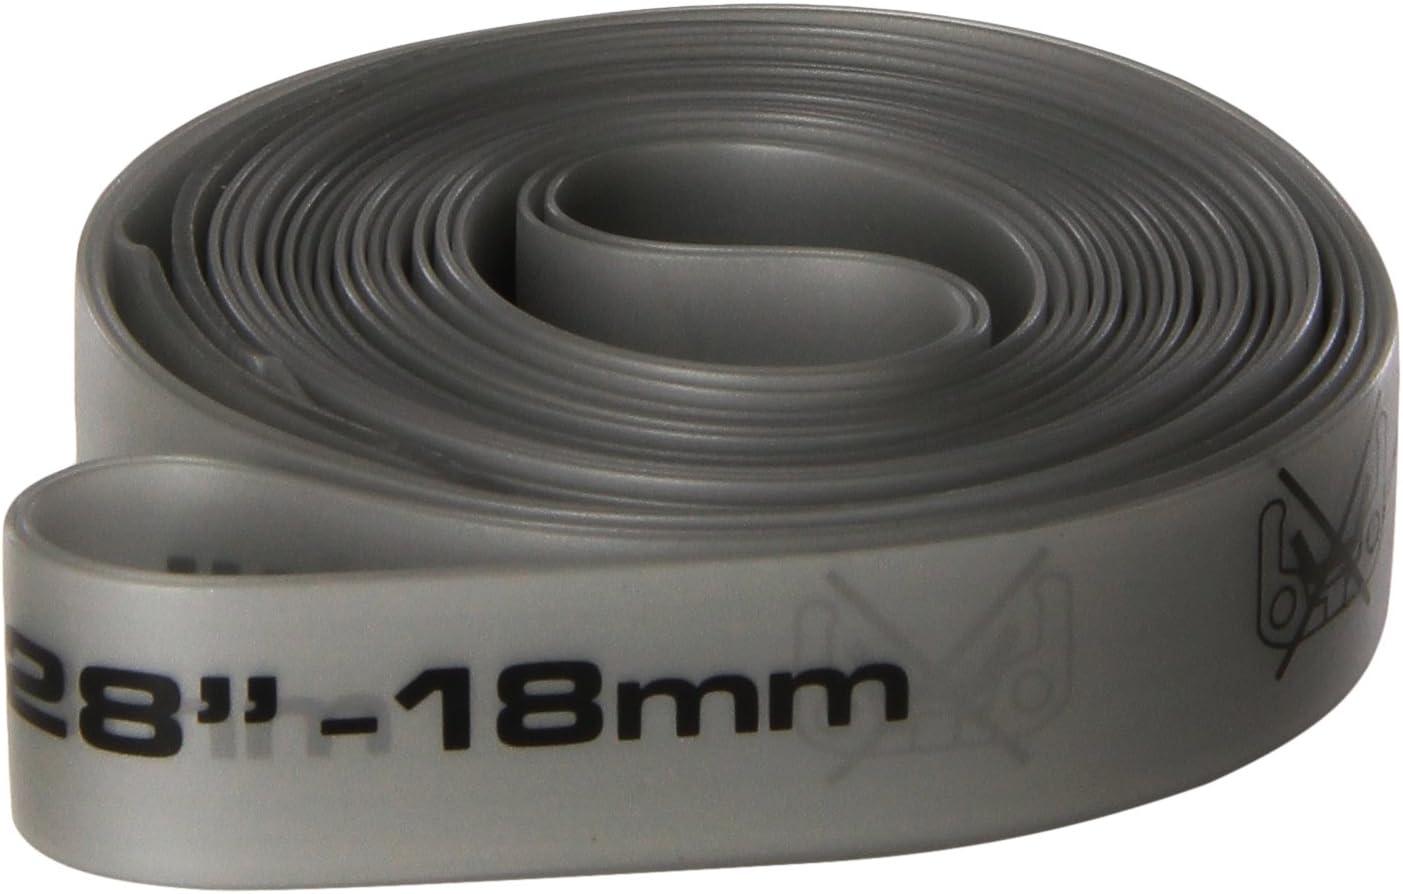 Zefal Soft PVC Rim Tape Rim Tape Zefal Pvc 22mm 26in Rd